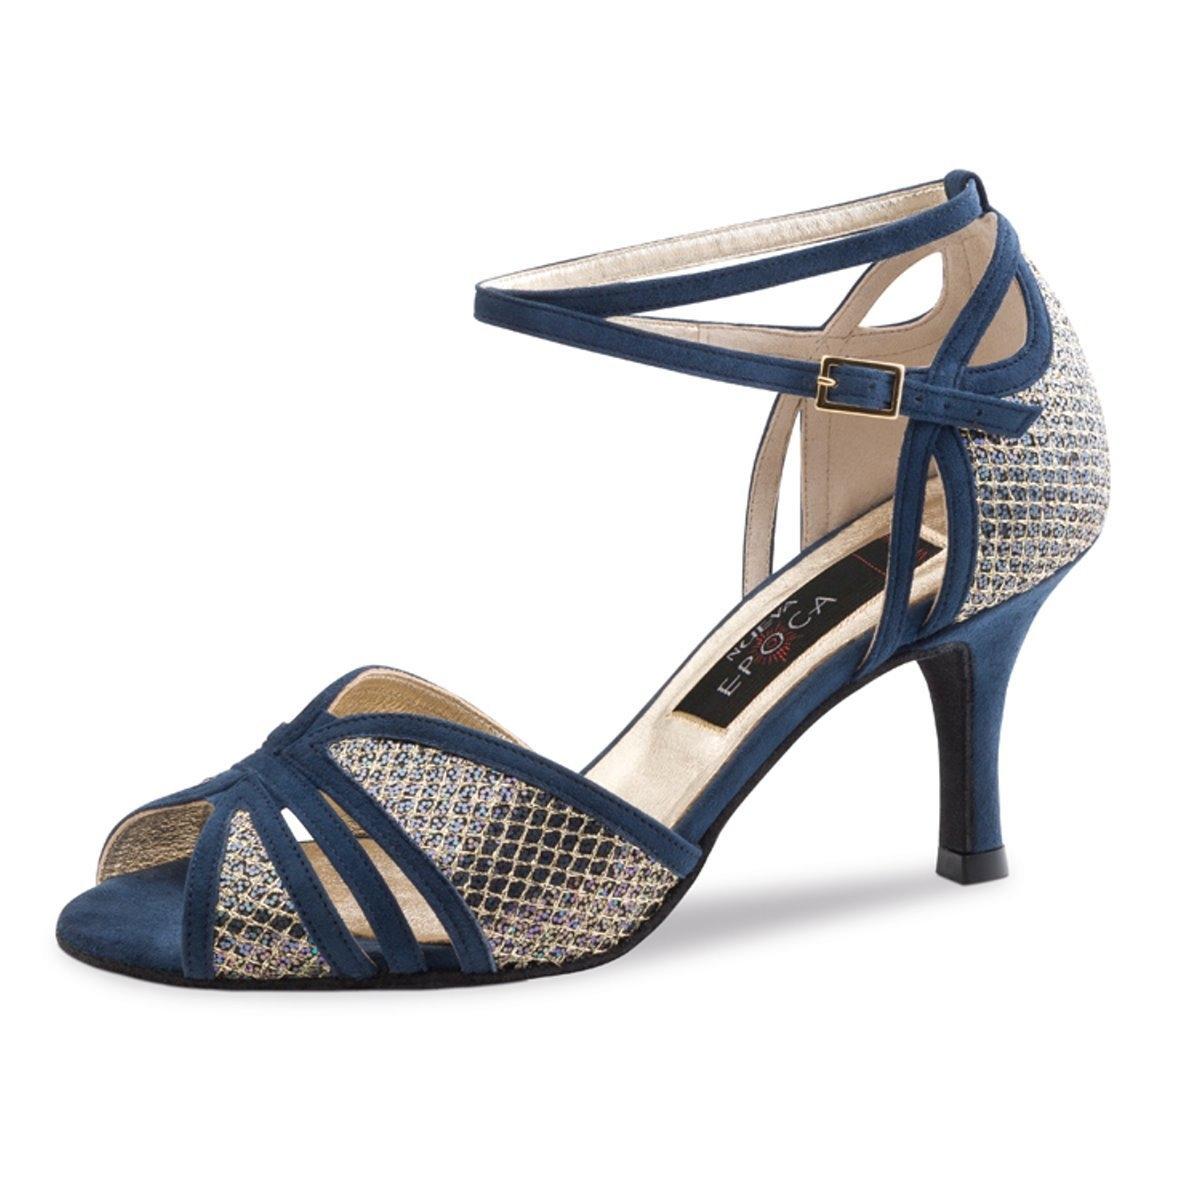 b739dc5ab2 Tiendas de zapatos de baile en Barcelona - go dance